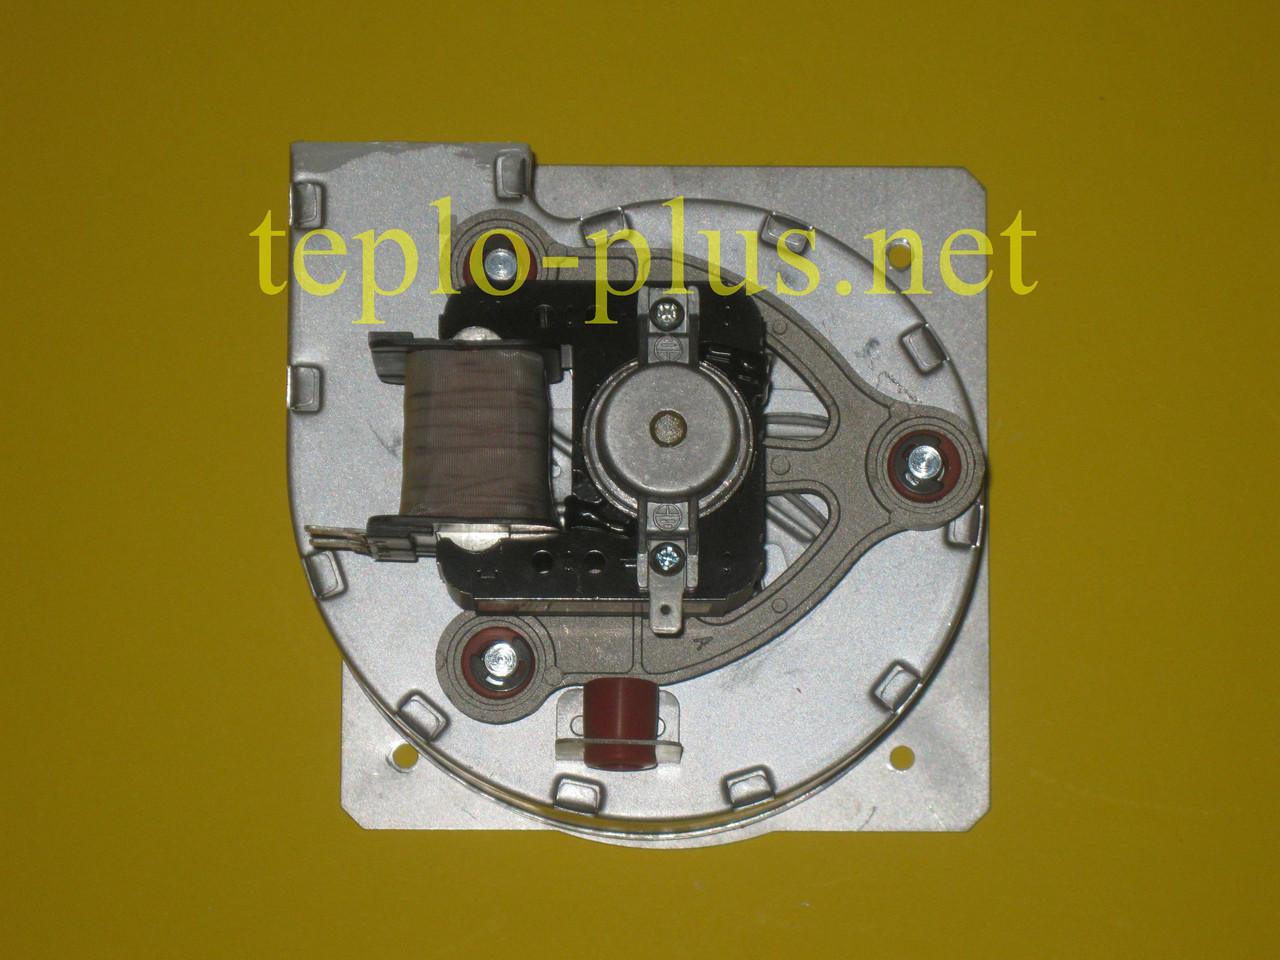 Вентилятор DM.85 AA10020002 Zoom Boilers Project 18 BF, Expert 18 BF, Master 18 BF, Rens 18 BF